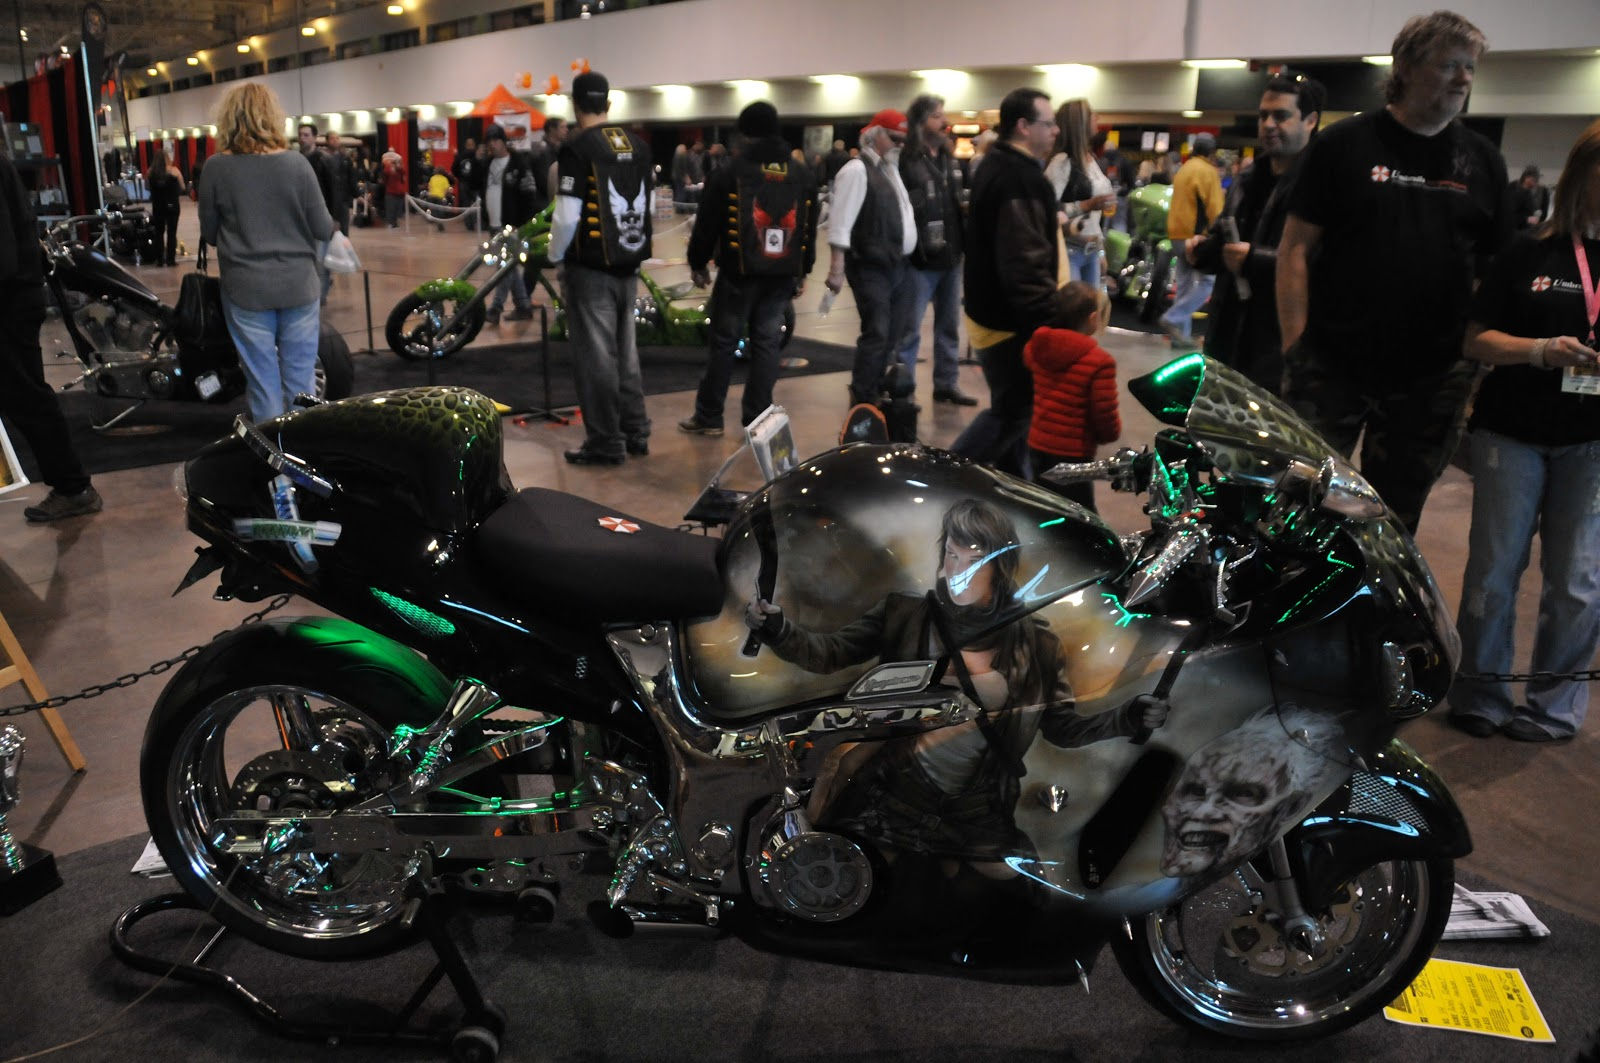 toronto grand prix tourist a toronto blog motorcycle shows in toronto 2018 a toronto blog. Black Bedroom Furniture Sets. Home Design Ideas